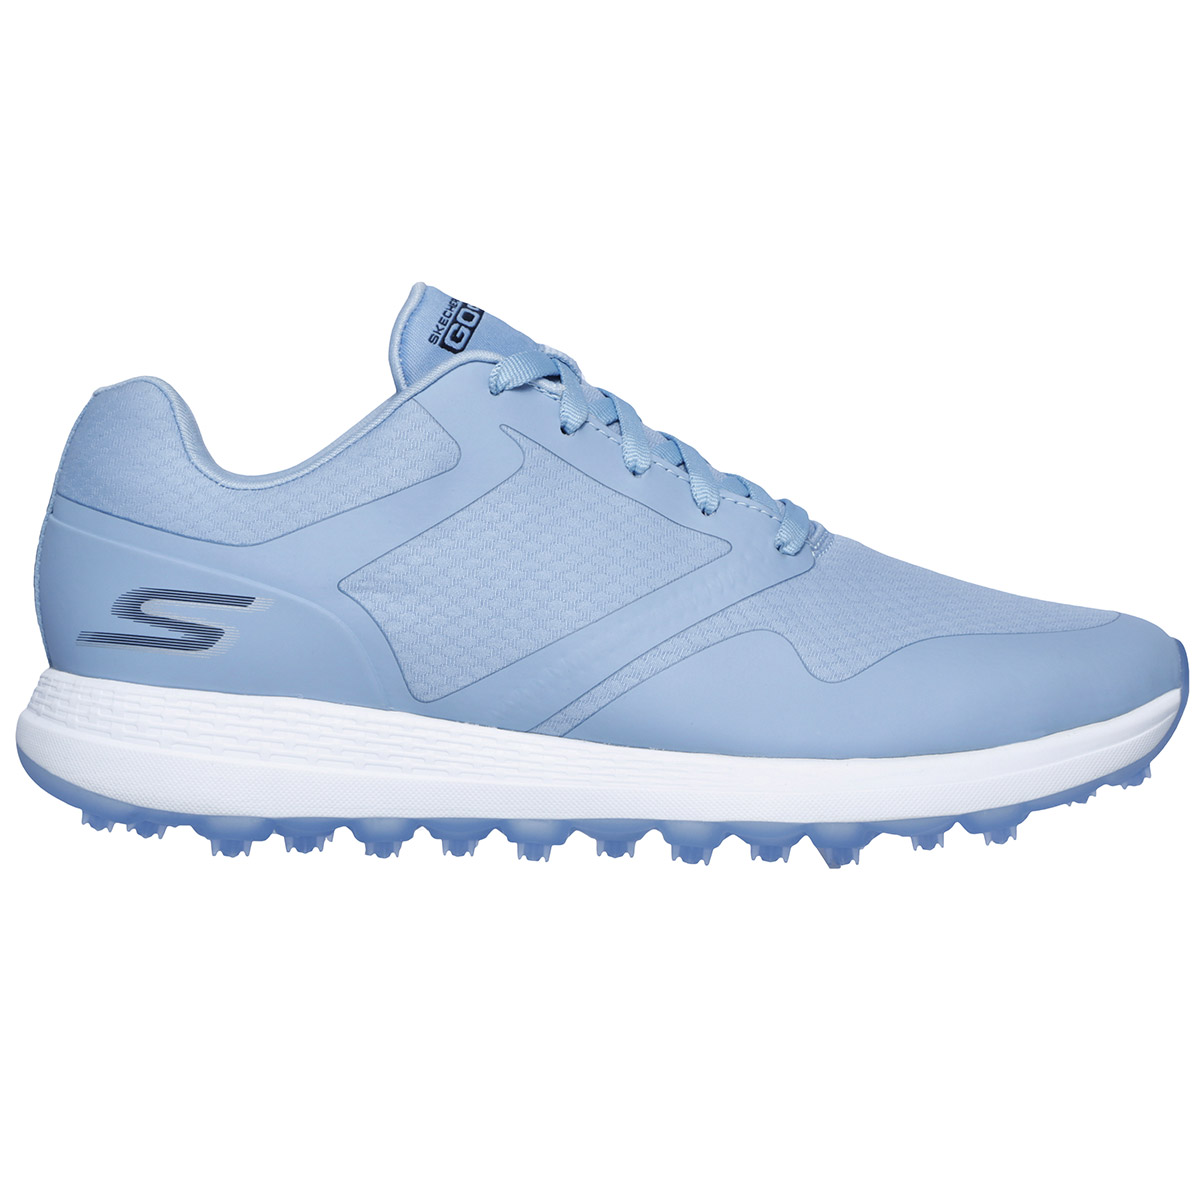 3dc5d23daf8e Skechers Ladies Go Golf Max Fade Shoes